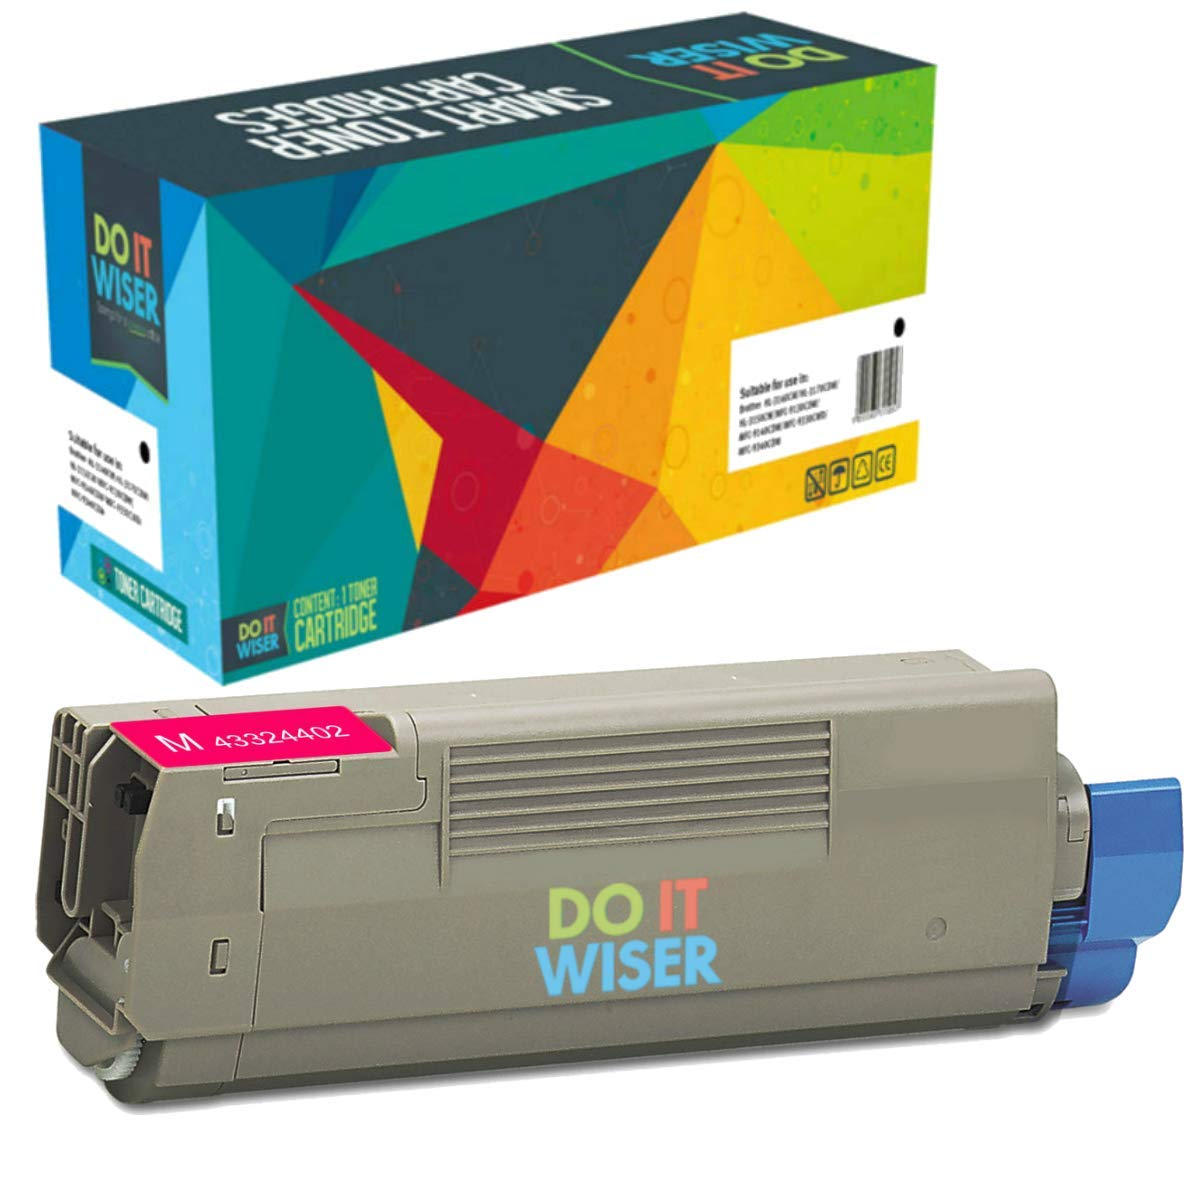 Toner Alternativo ( X1 ) Magenta C5500 C5500n C5500dn C5800 C5800n C5800dln C5650-43324402